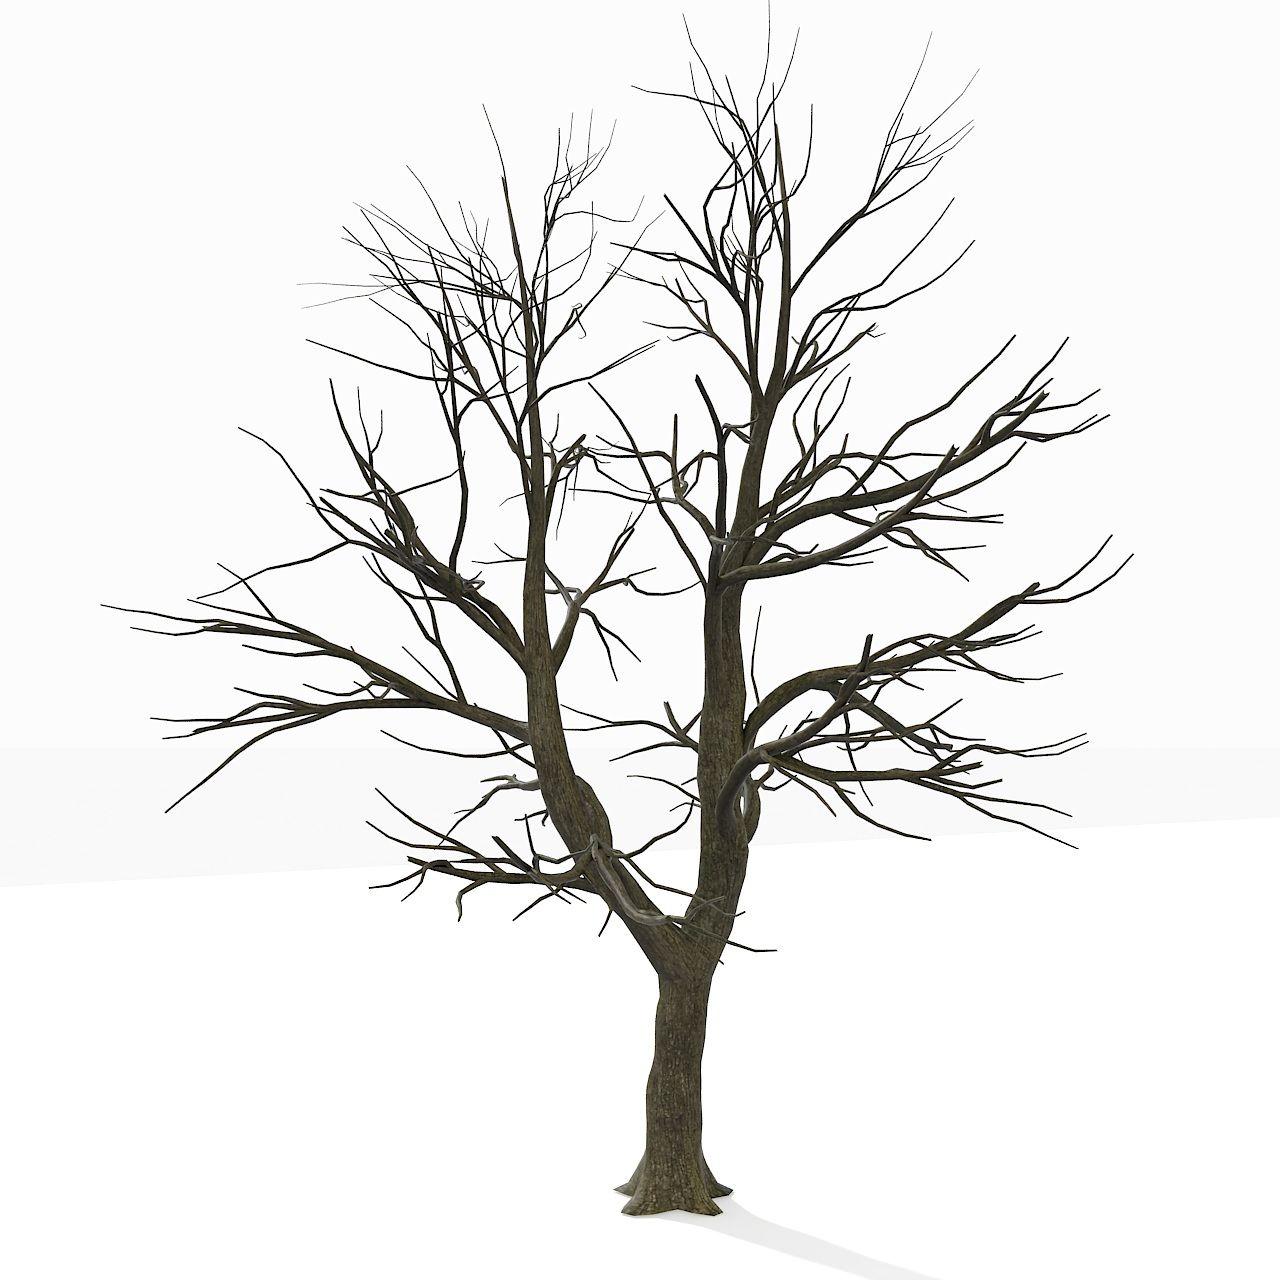 1280x1280 Bare Tree Coloring Page. Bare Tree Coloring Page Free Printable